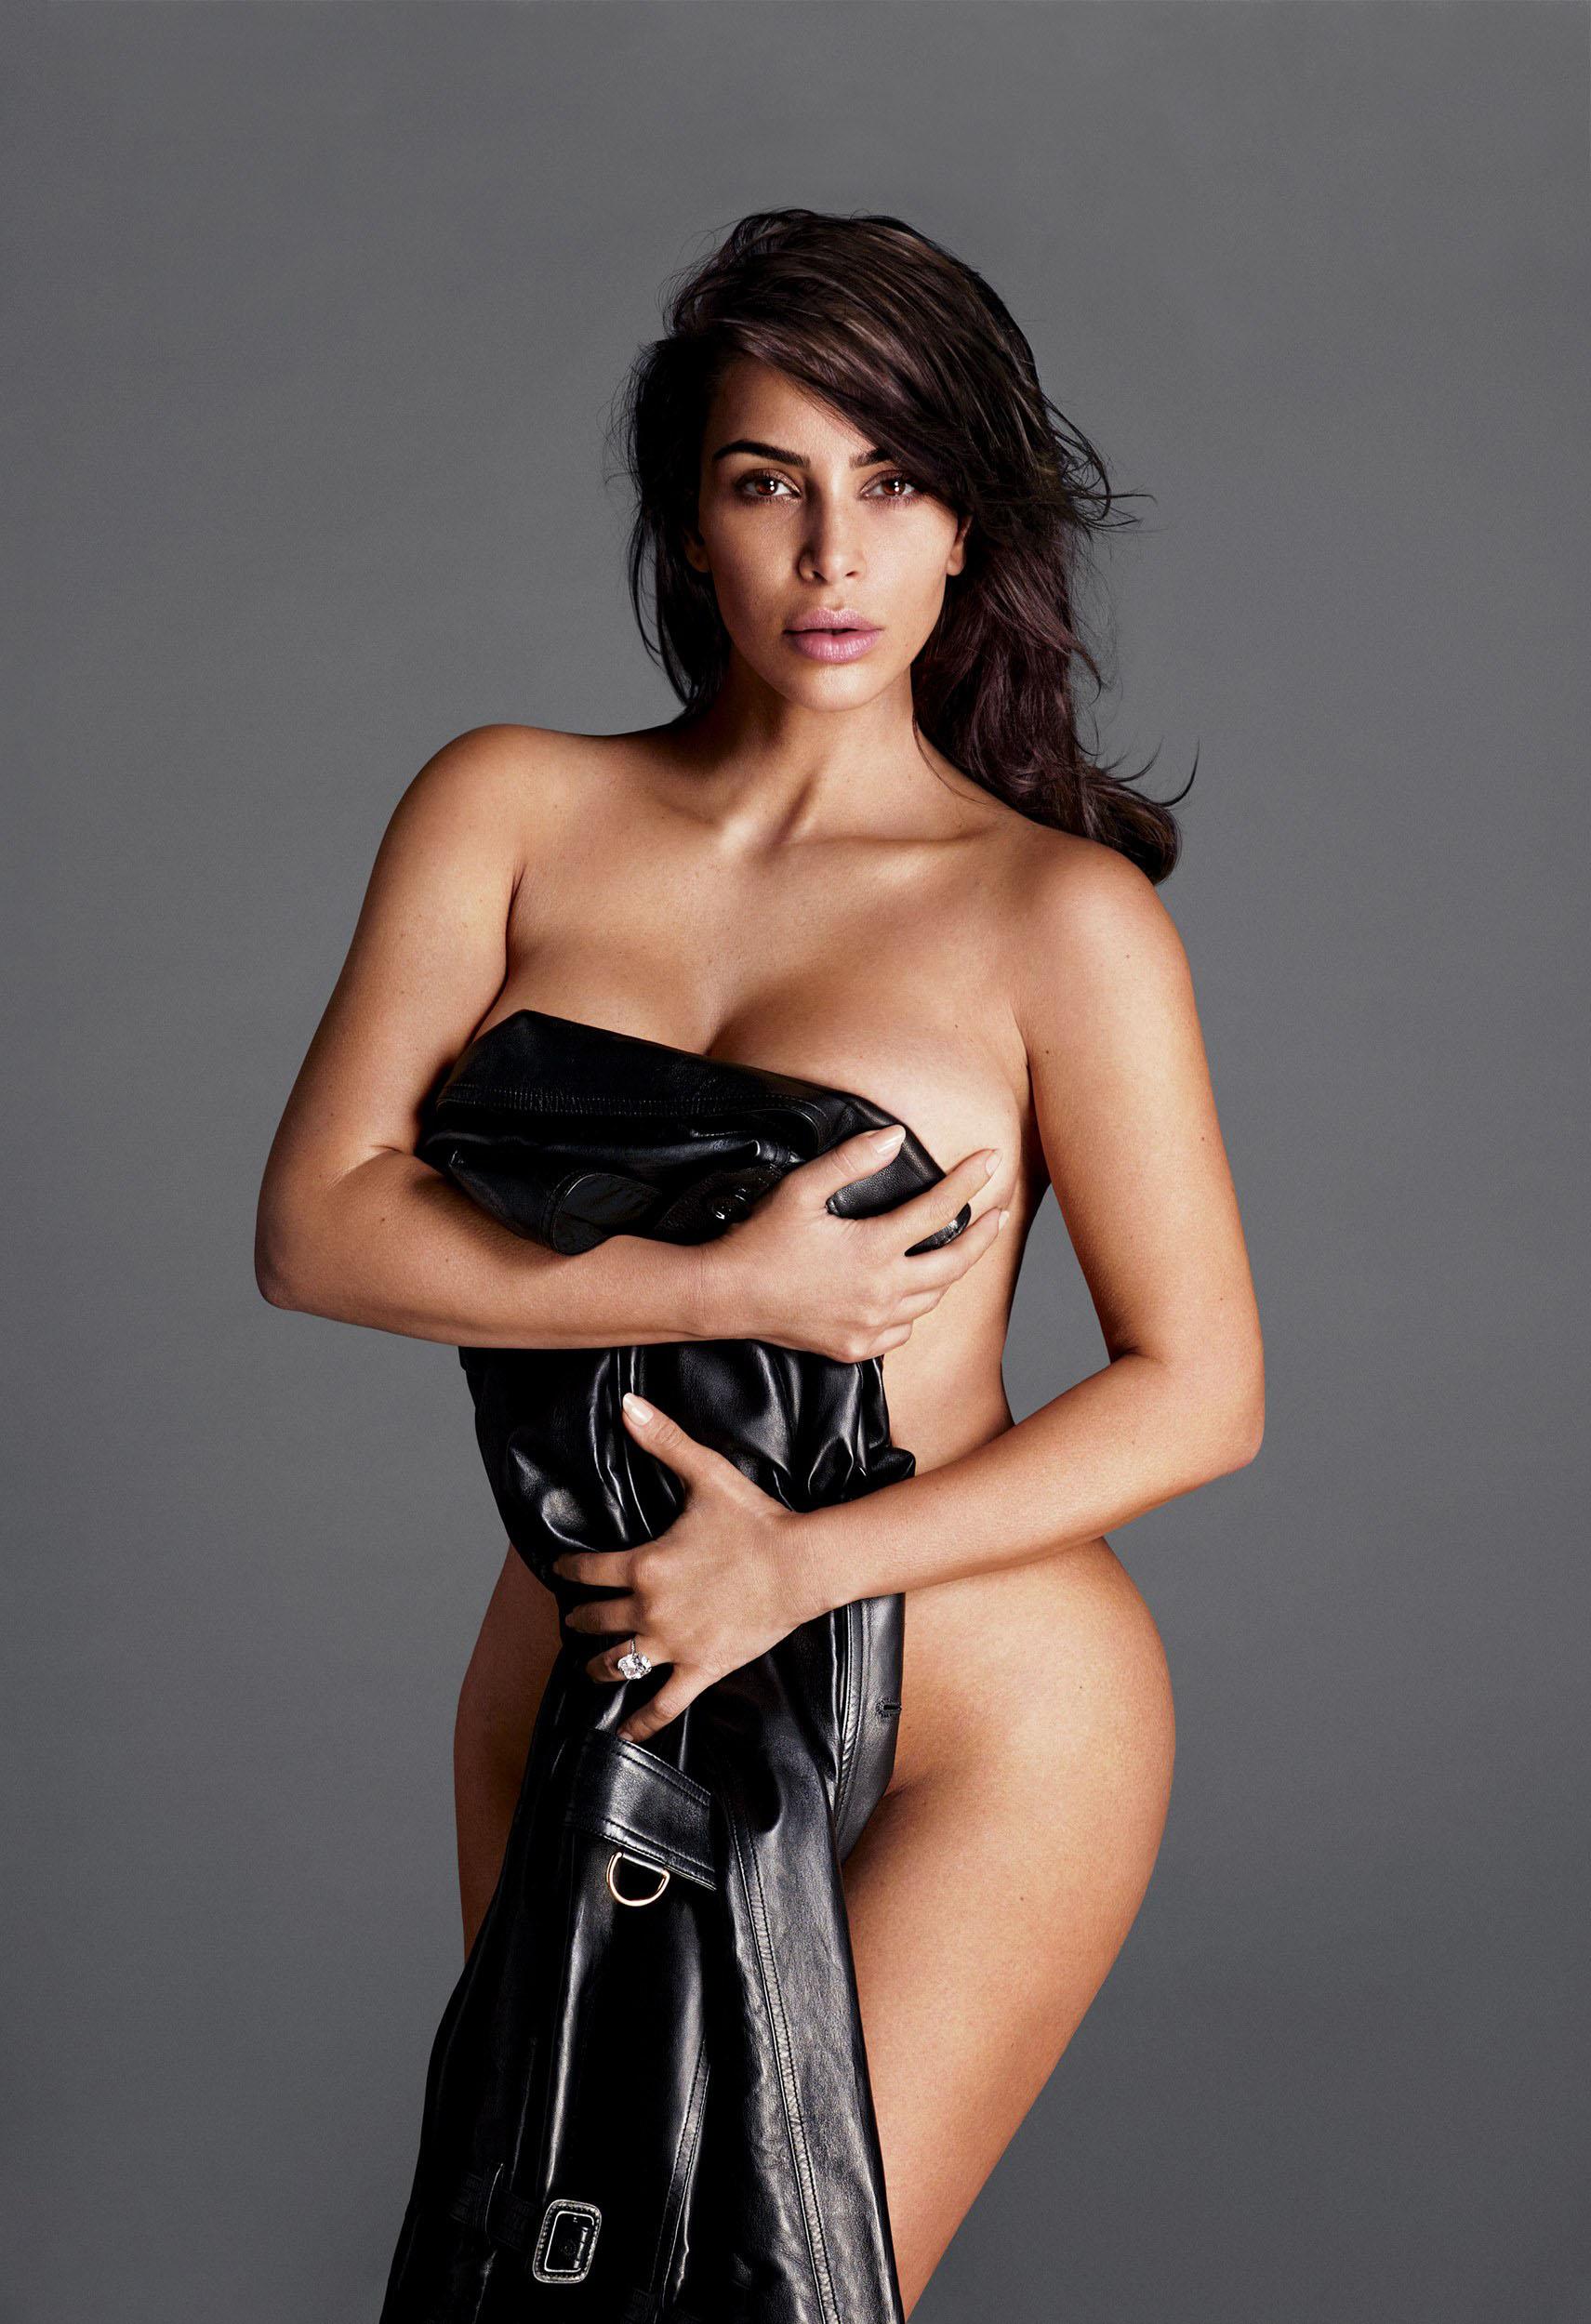 Similar it. hot nude pictures of kim kardashian assured